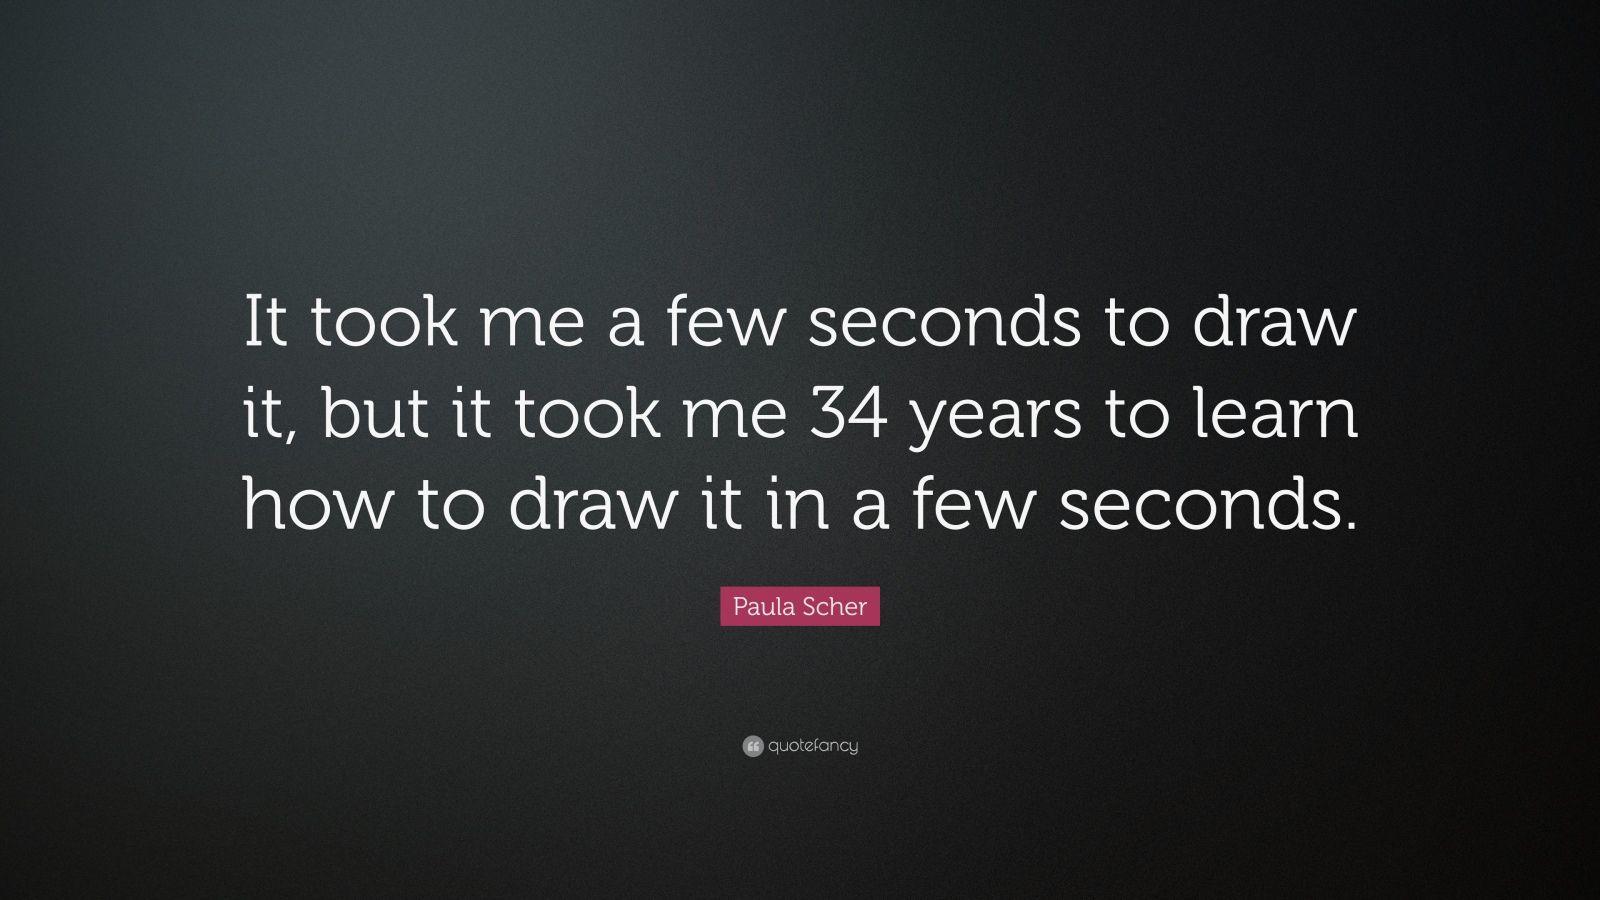 paula scher essay Paula scher's work spans over 3 decades paula scher studied at the tyler school of art in philadelphia at tyler school of art in philadelphia, she was taught the.